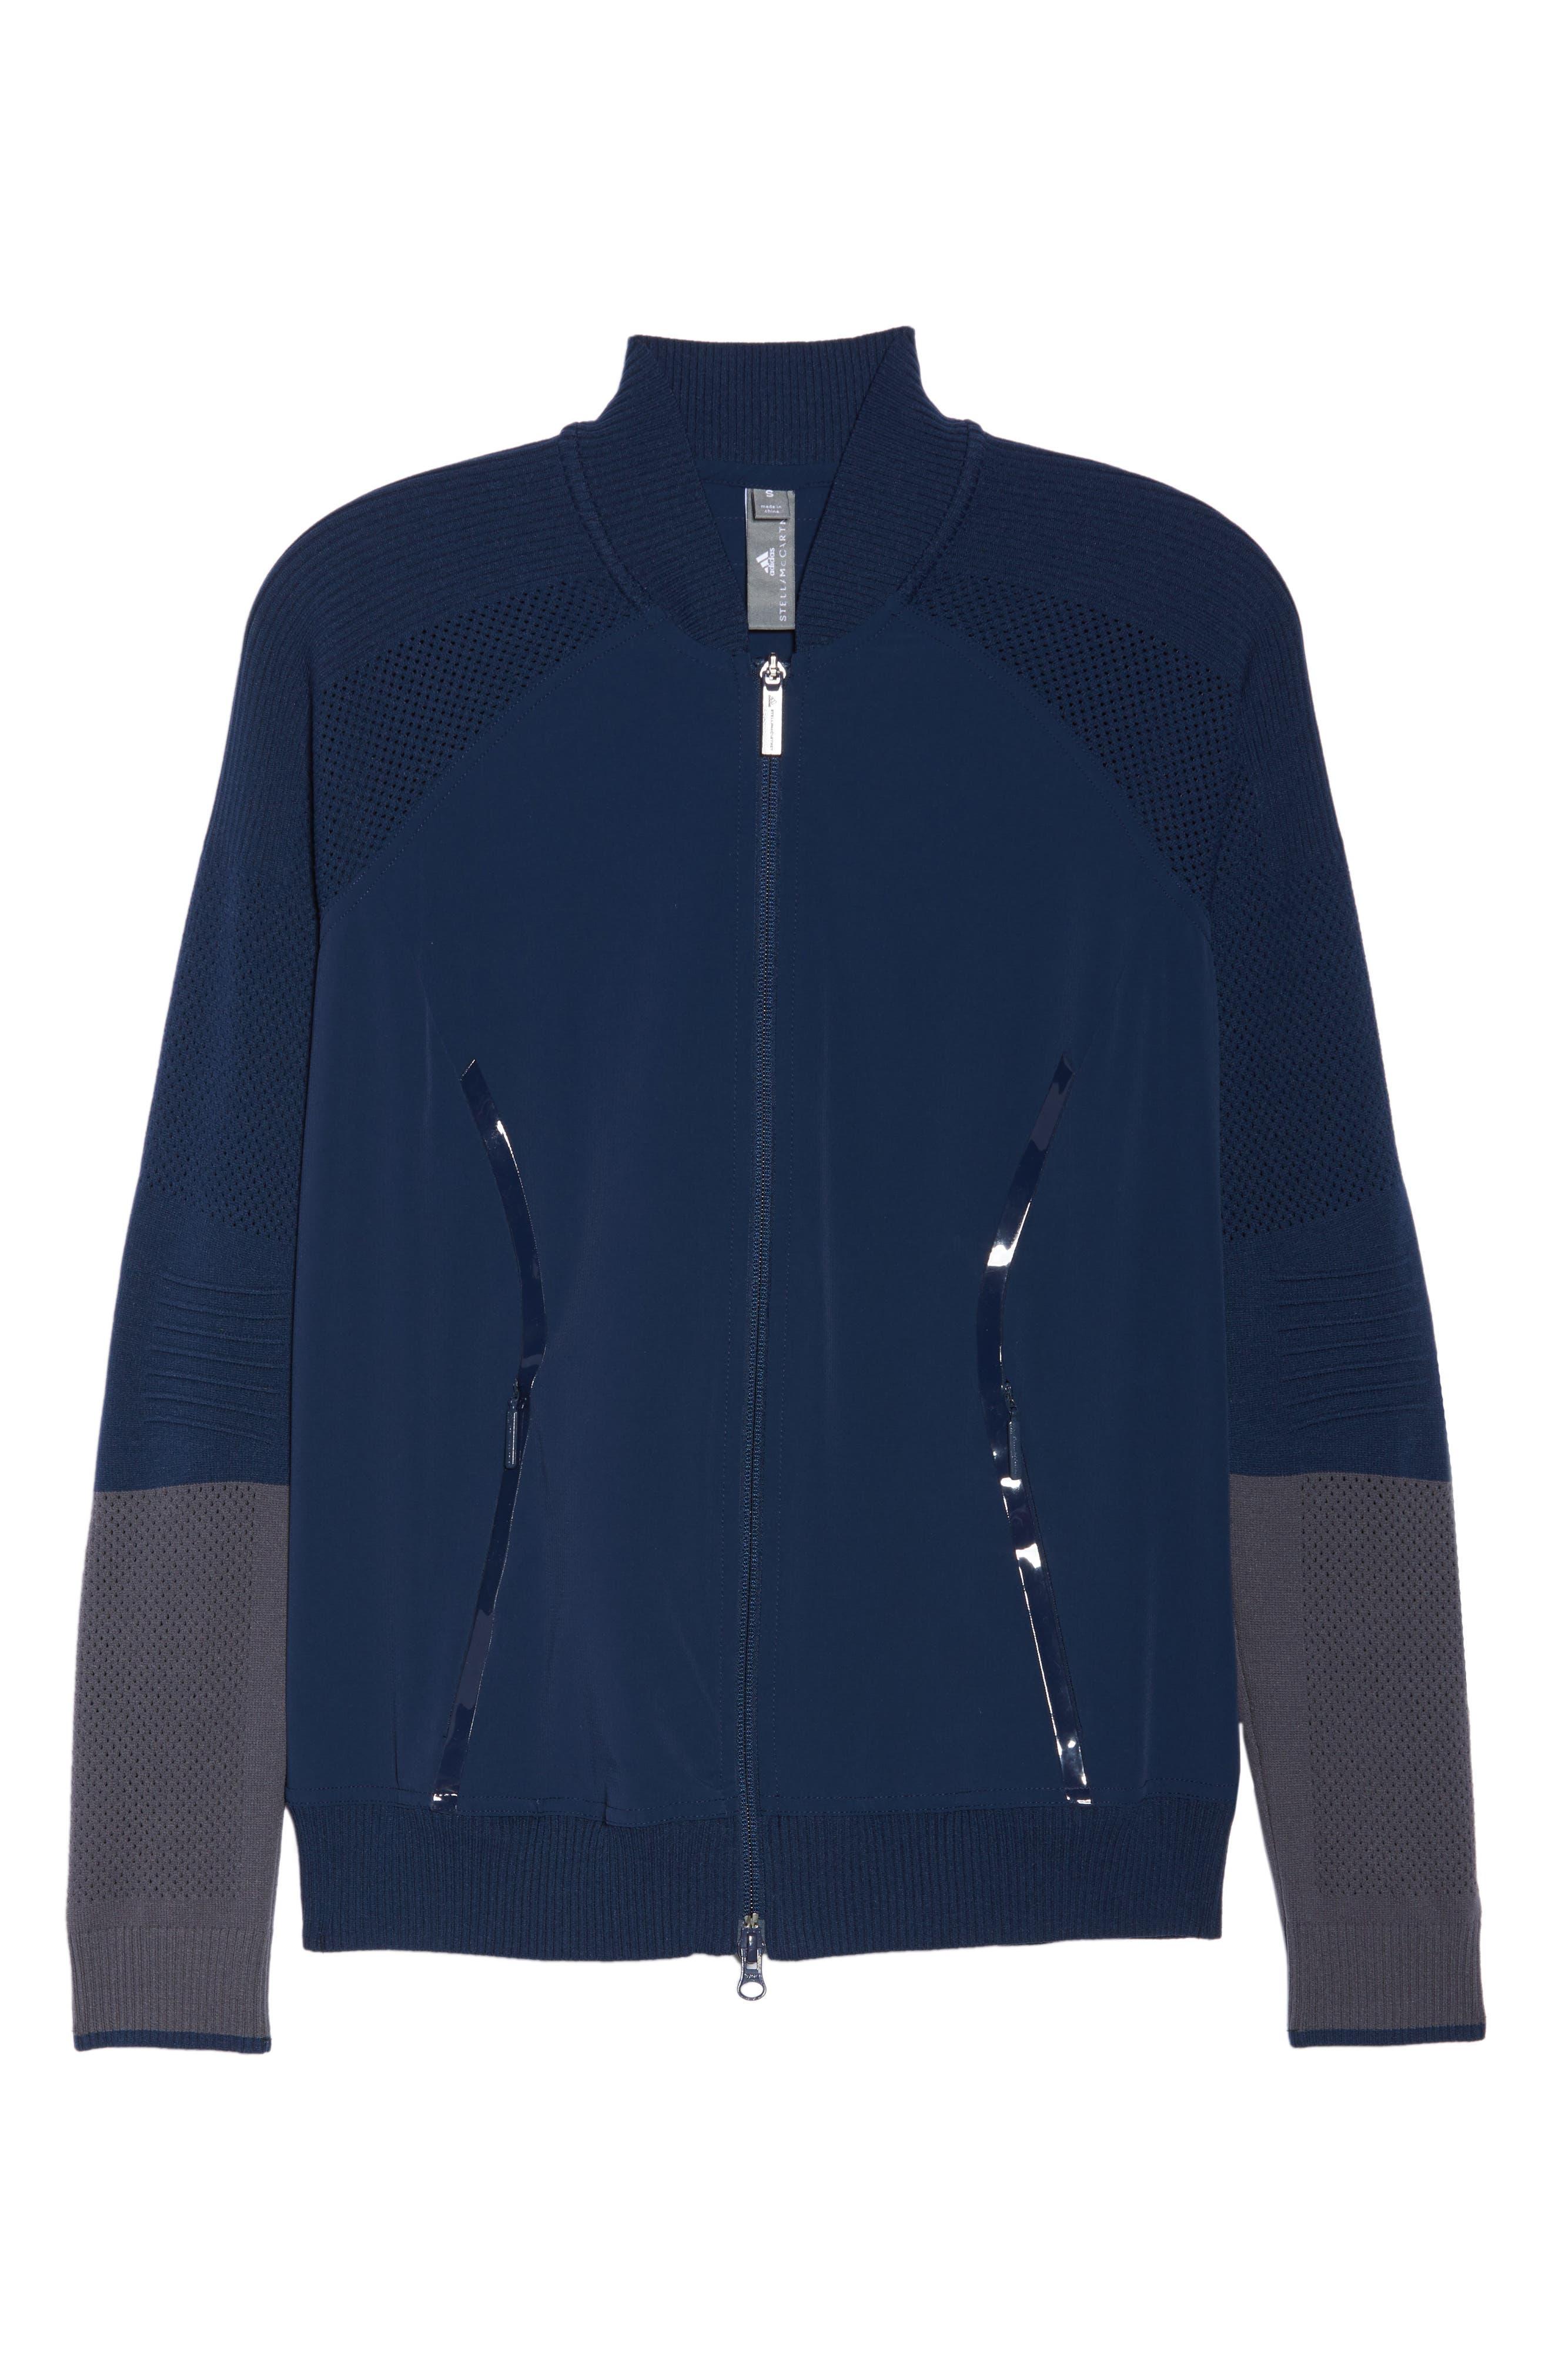 Run Ultra Knit & Woven Jacket,                             Alternate thumbnail 7, color,                             415